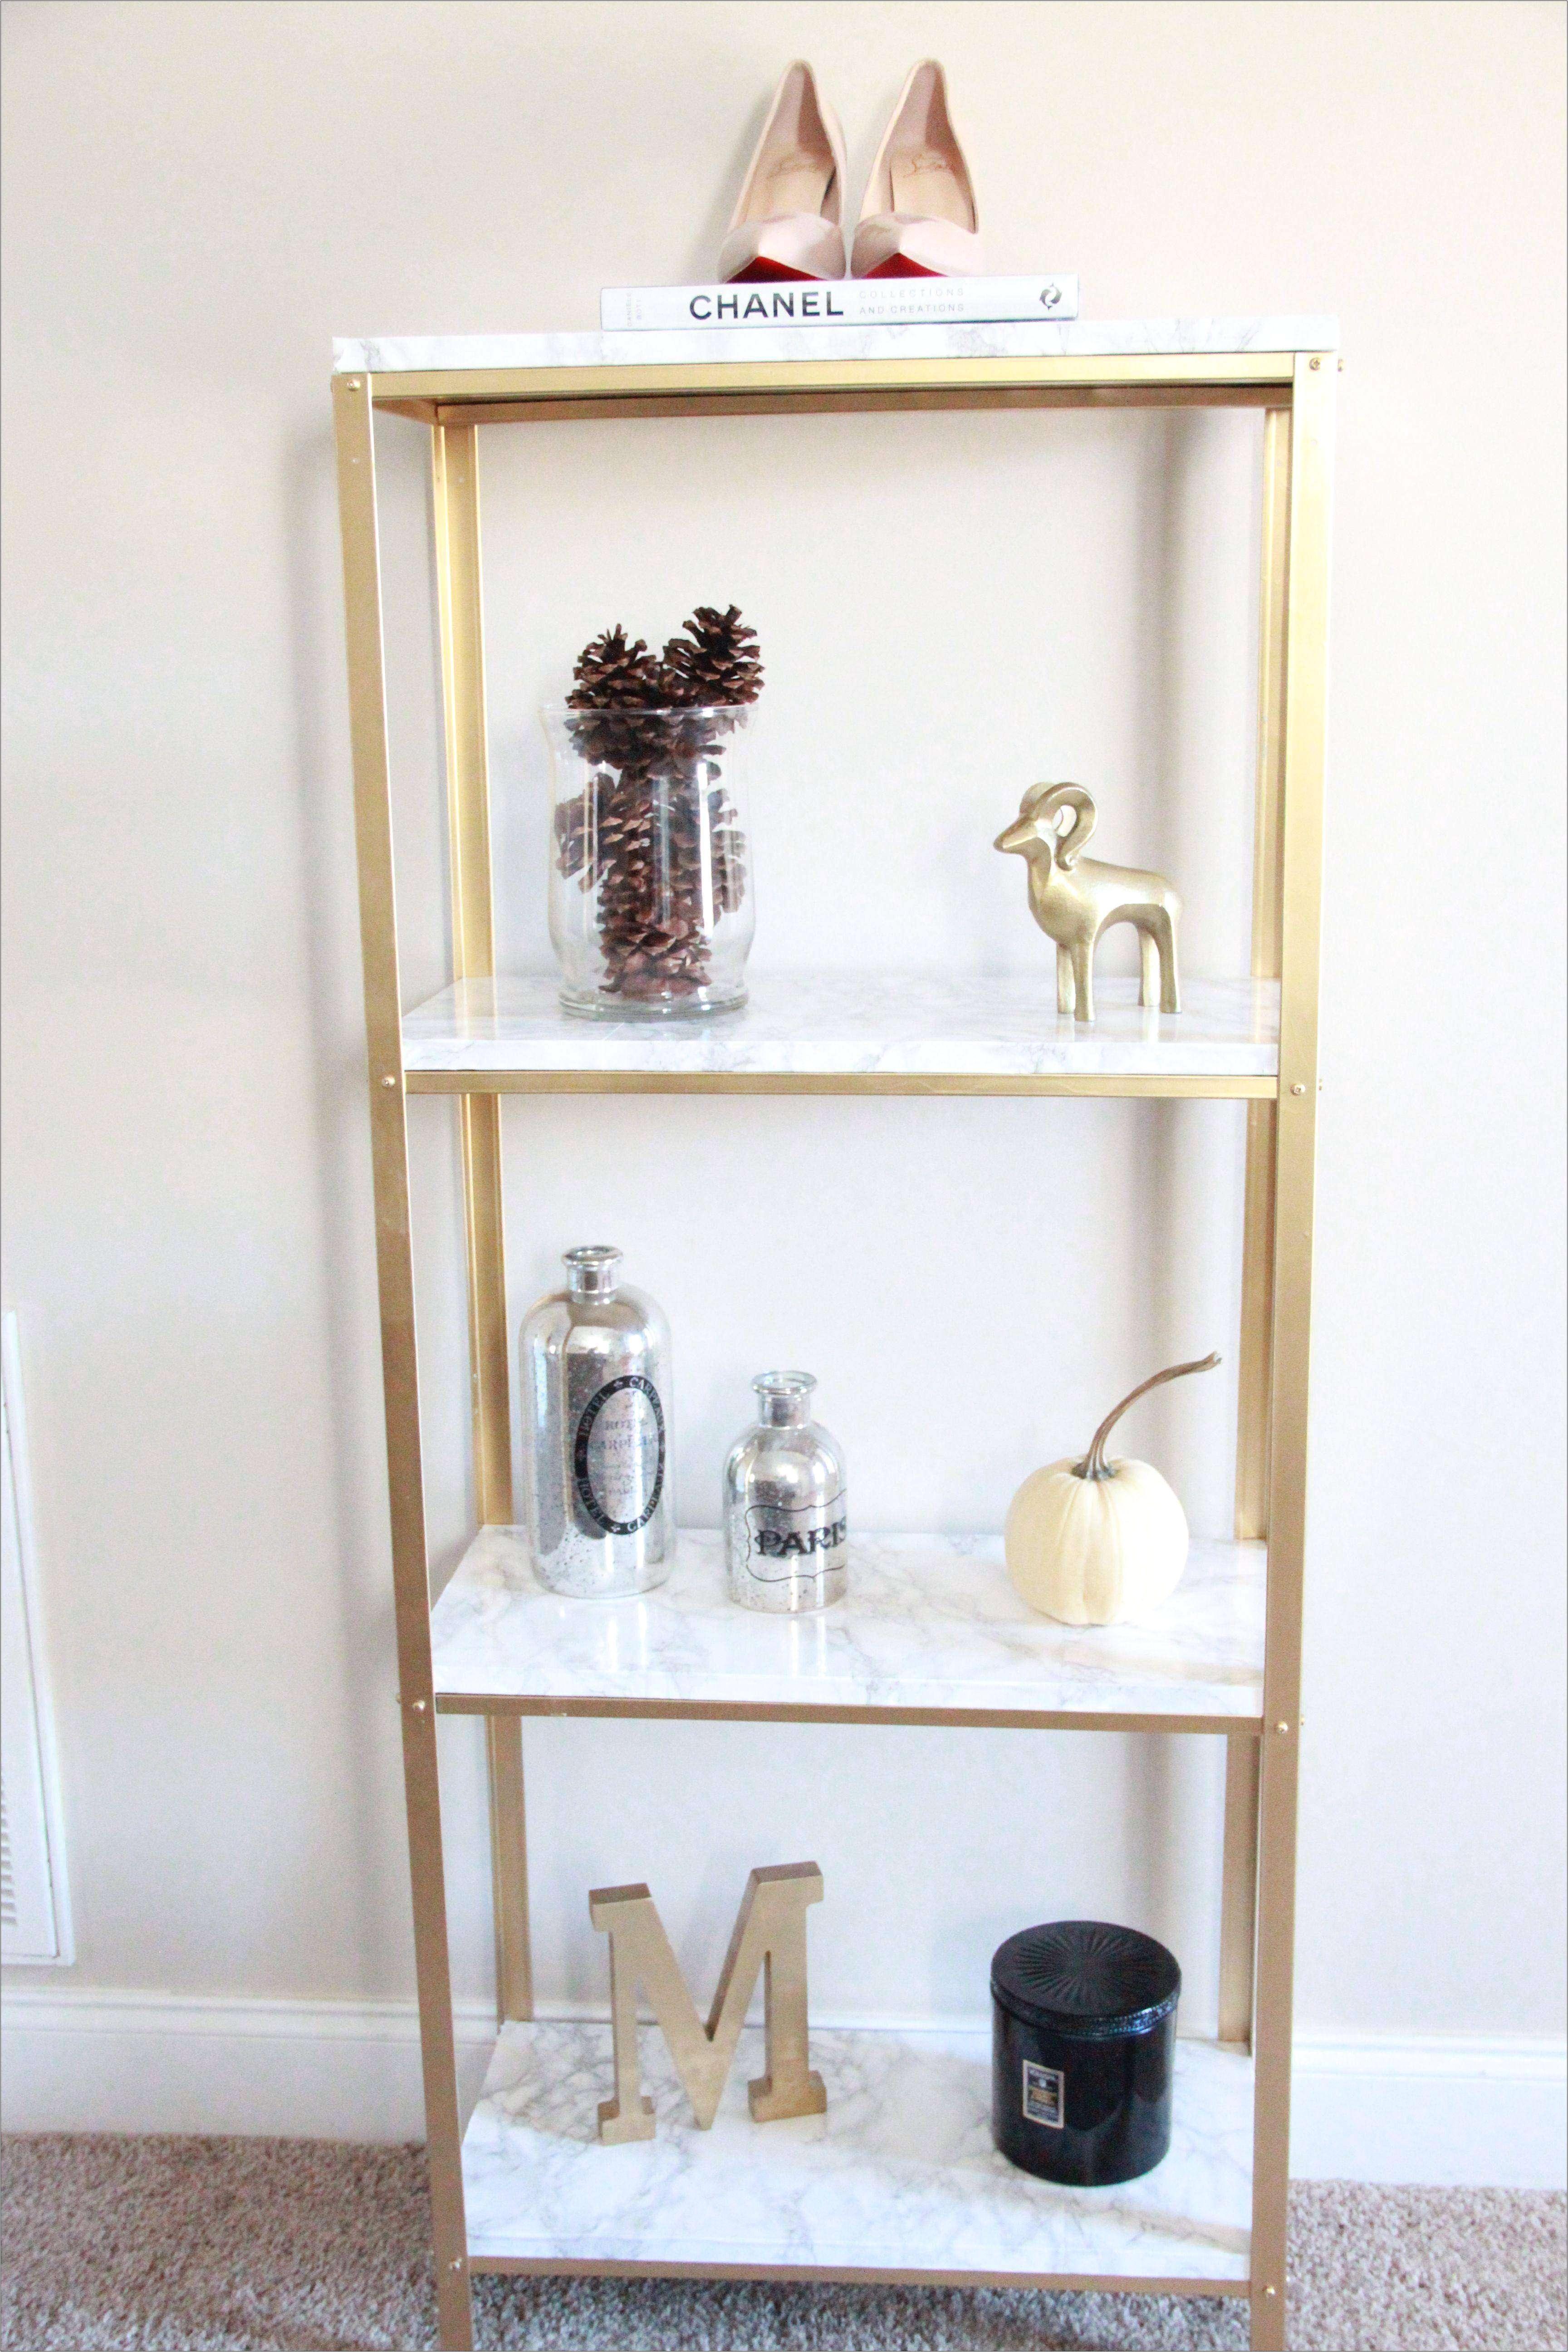 bedroom ideas ikea kids rooms awesome wall bookshelf 0d tags scheme design of kitchen shelves ideas